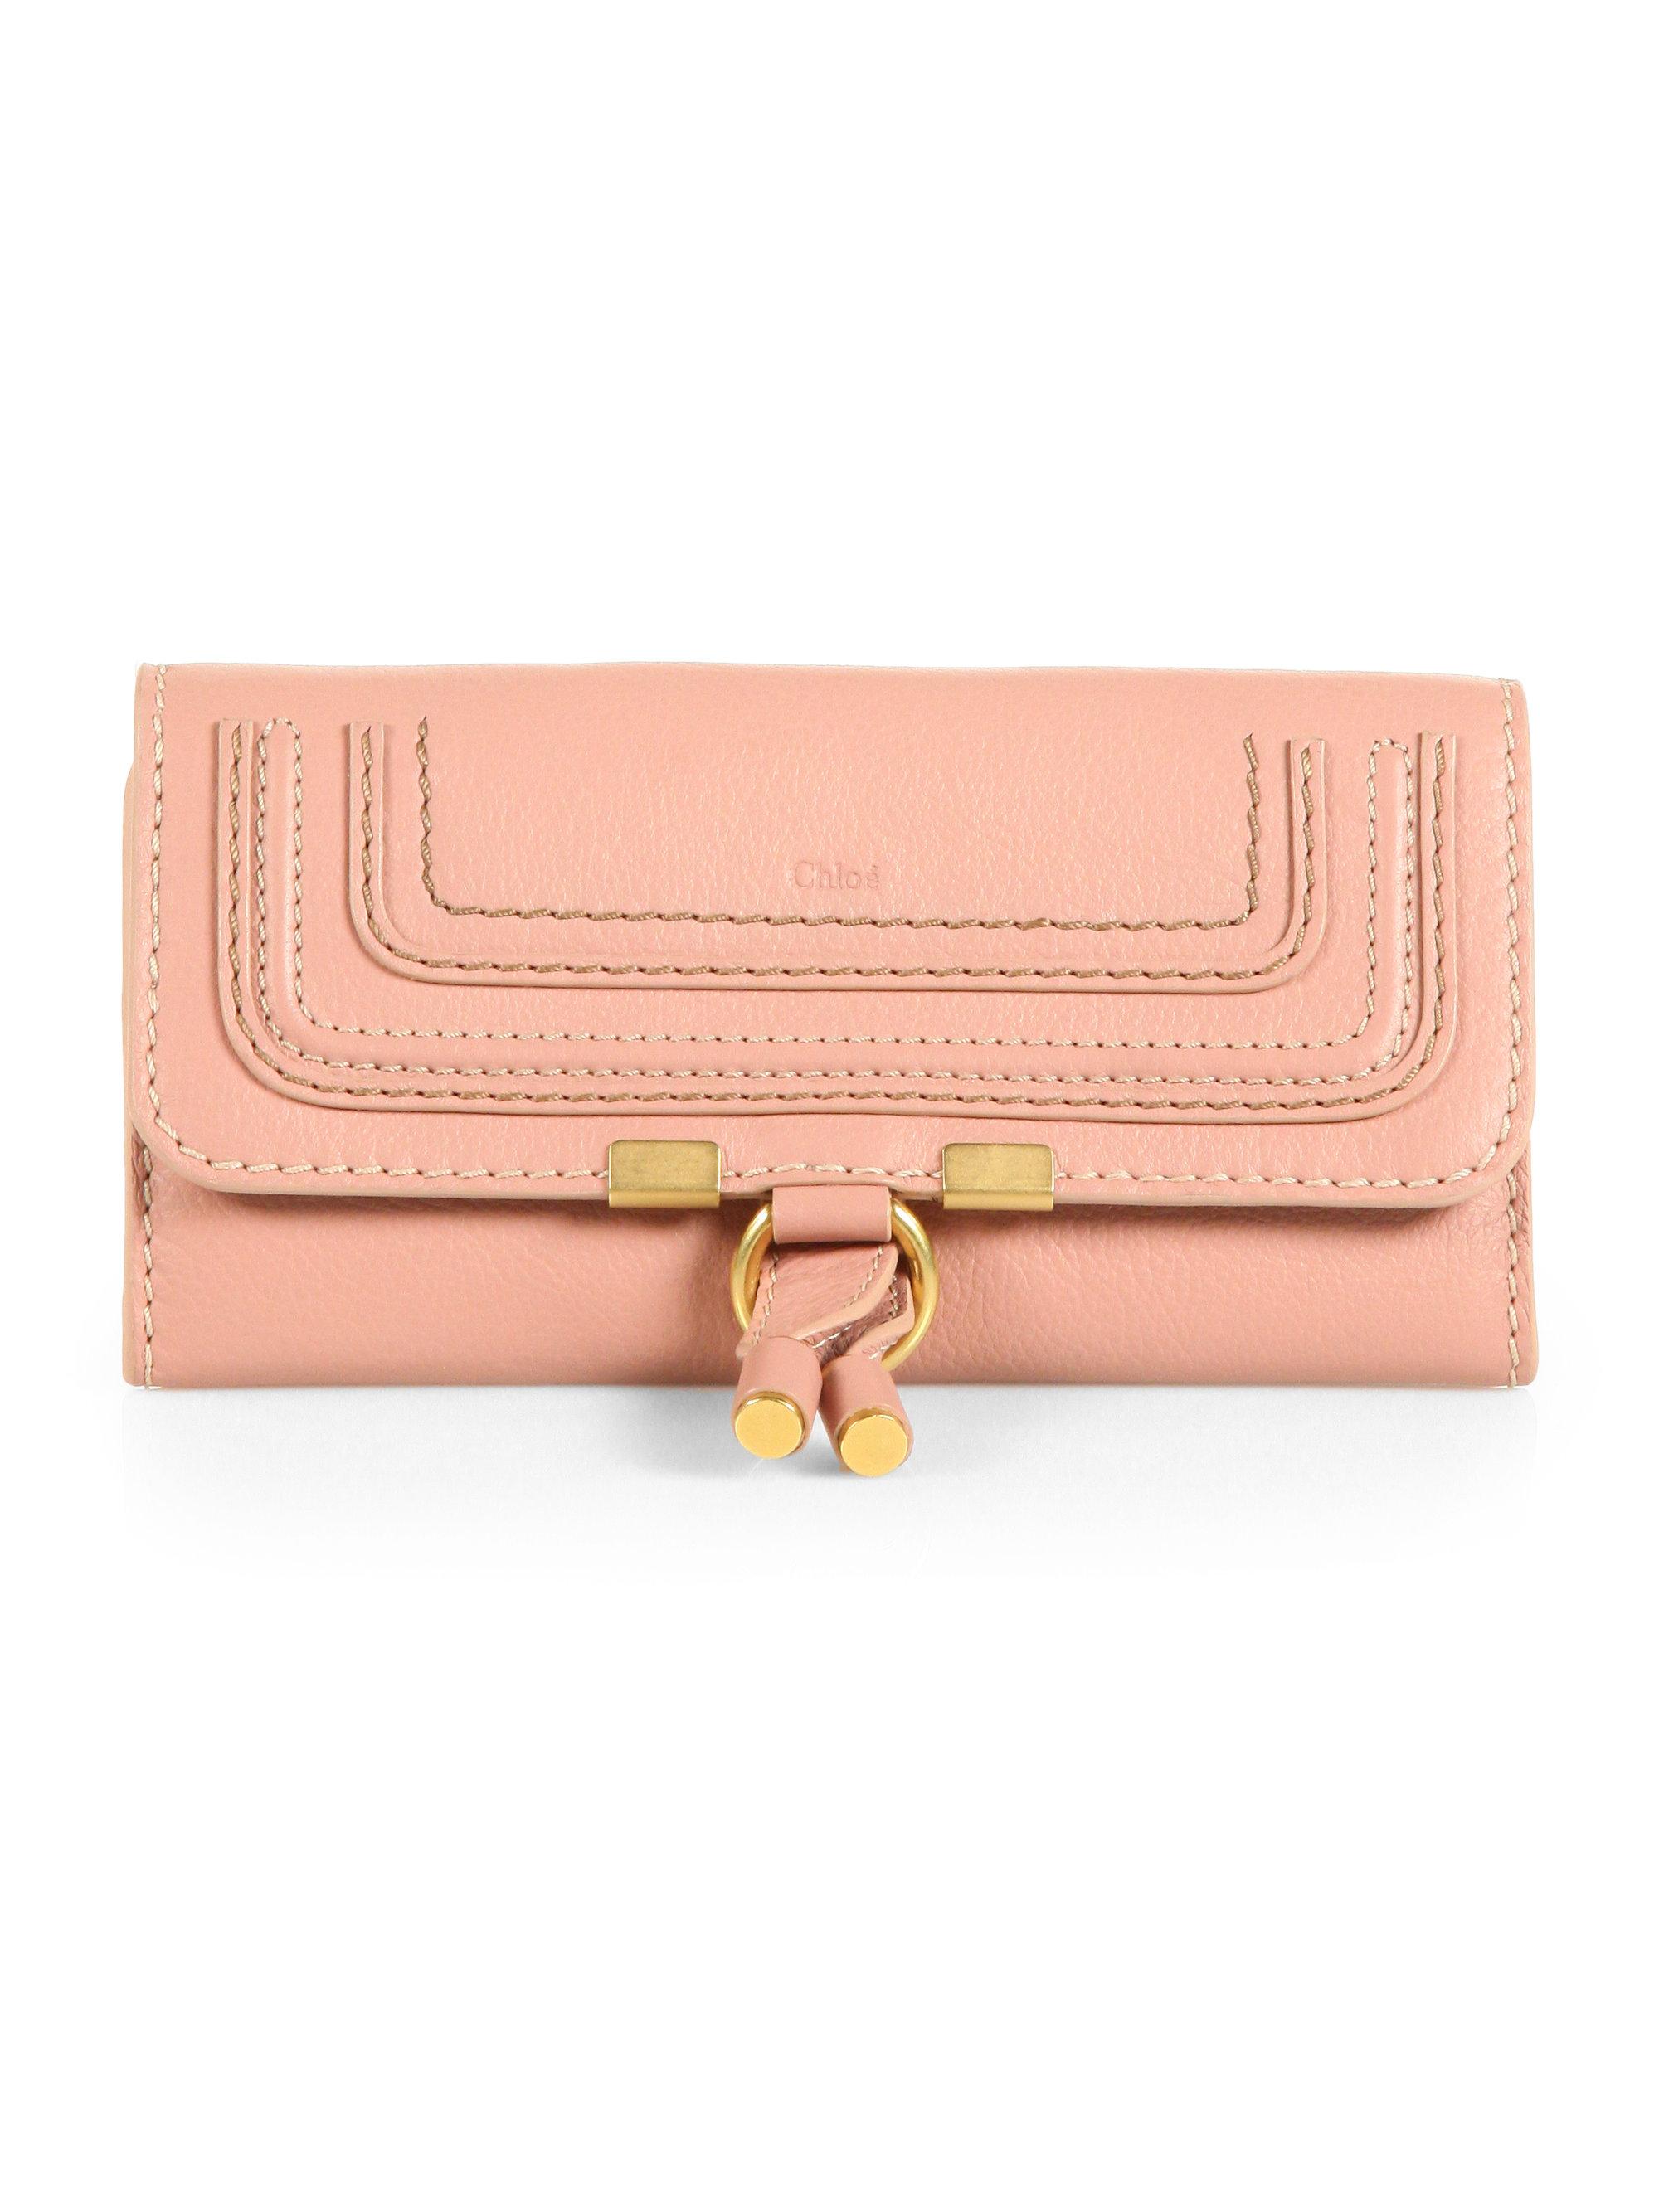 gray chloe bag - chloe yellow and tan long flap drew wallet, replica chloe